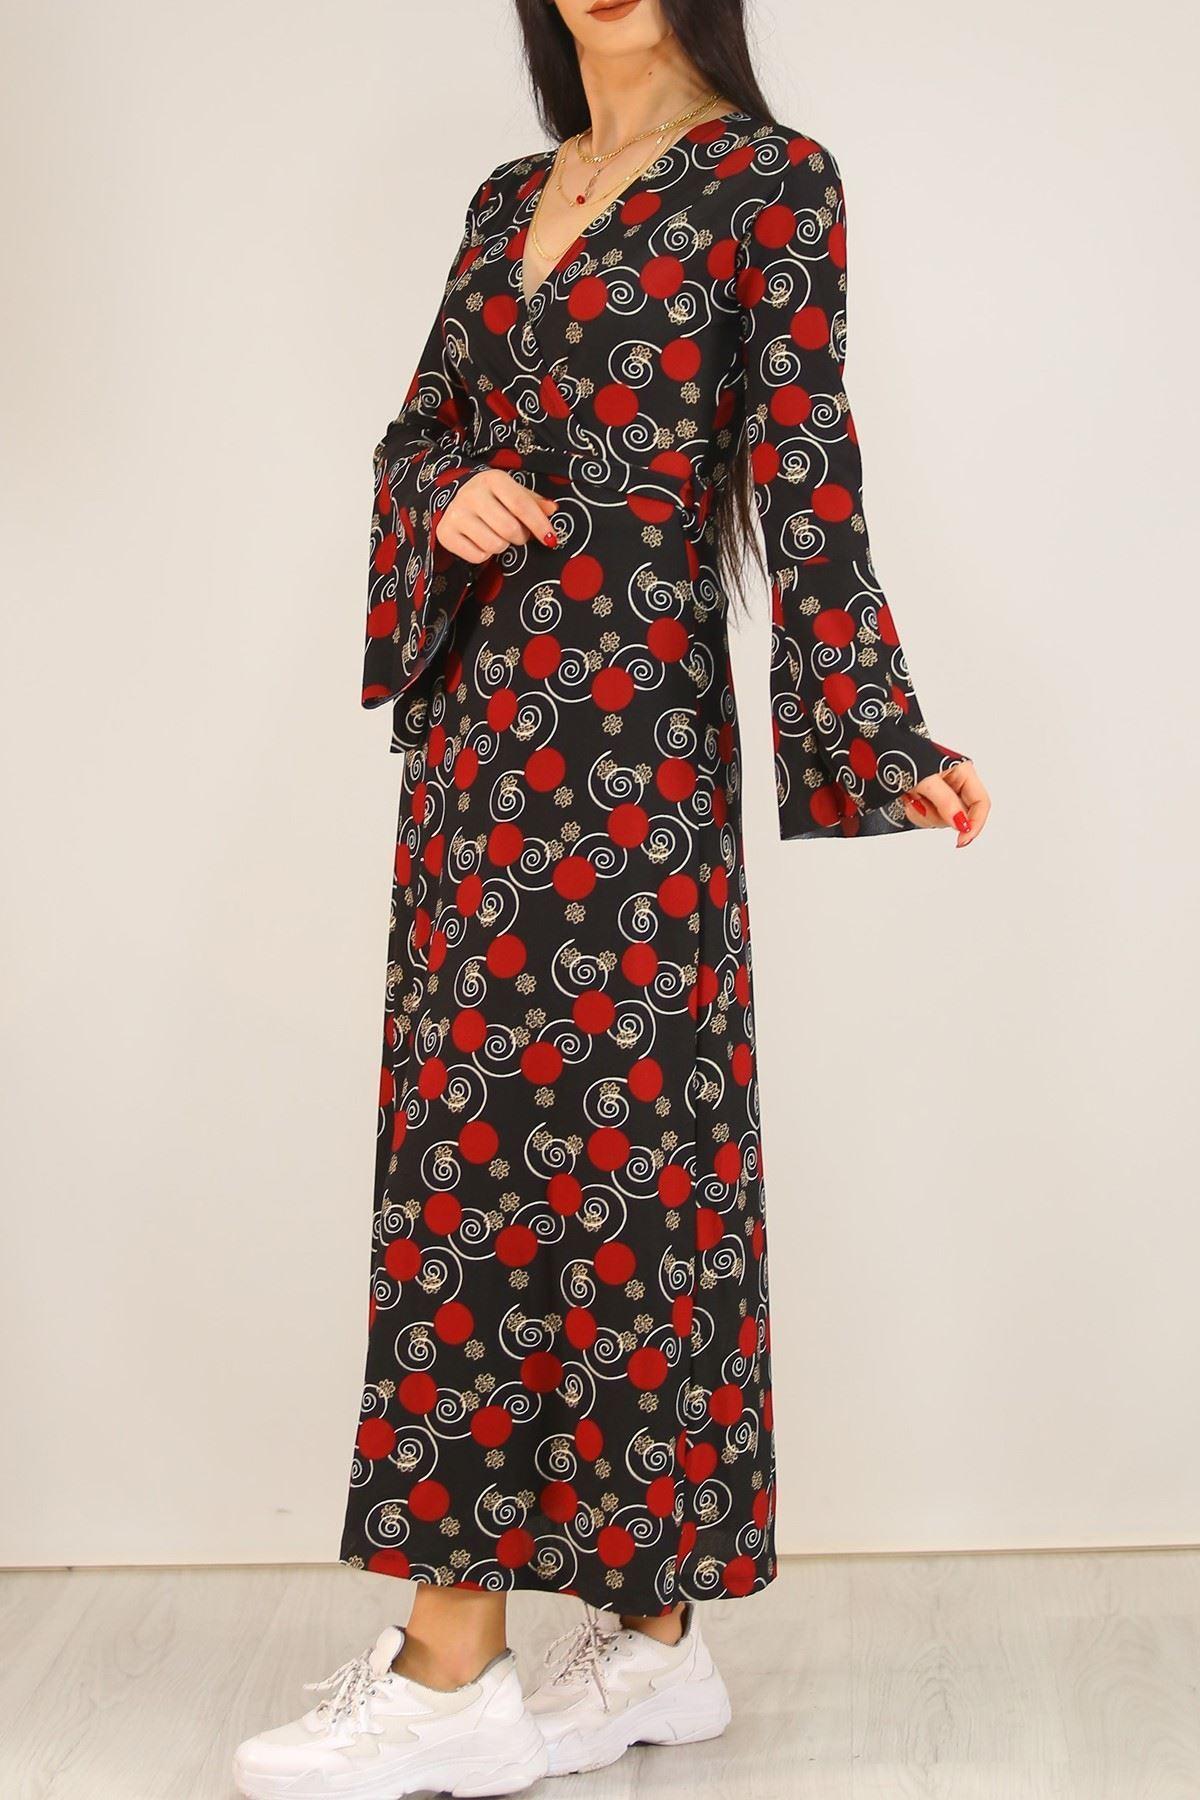 Desenli Elbise Siyahbordo - 5075.716.